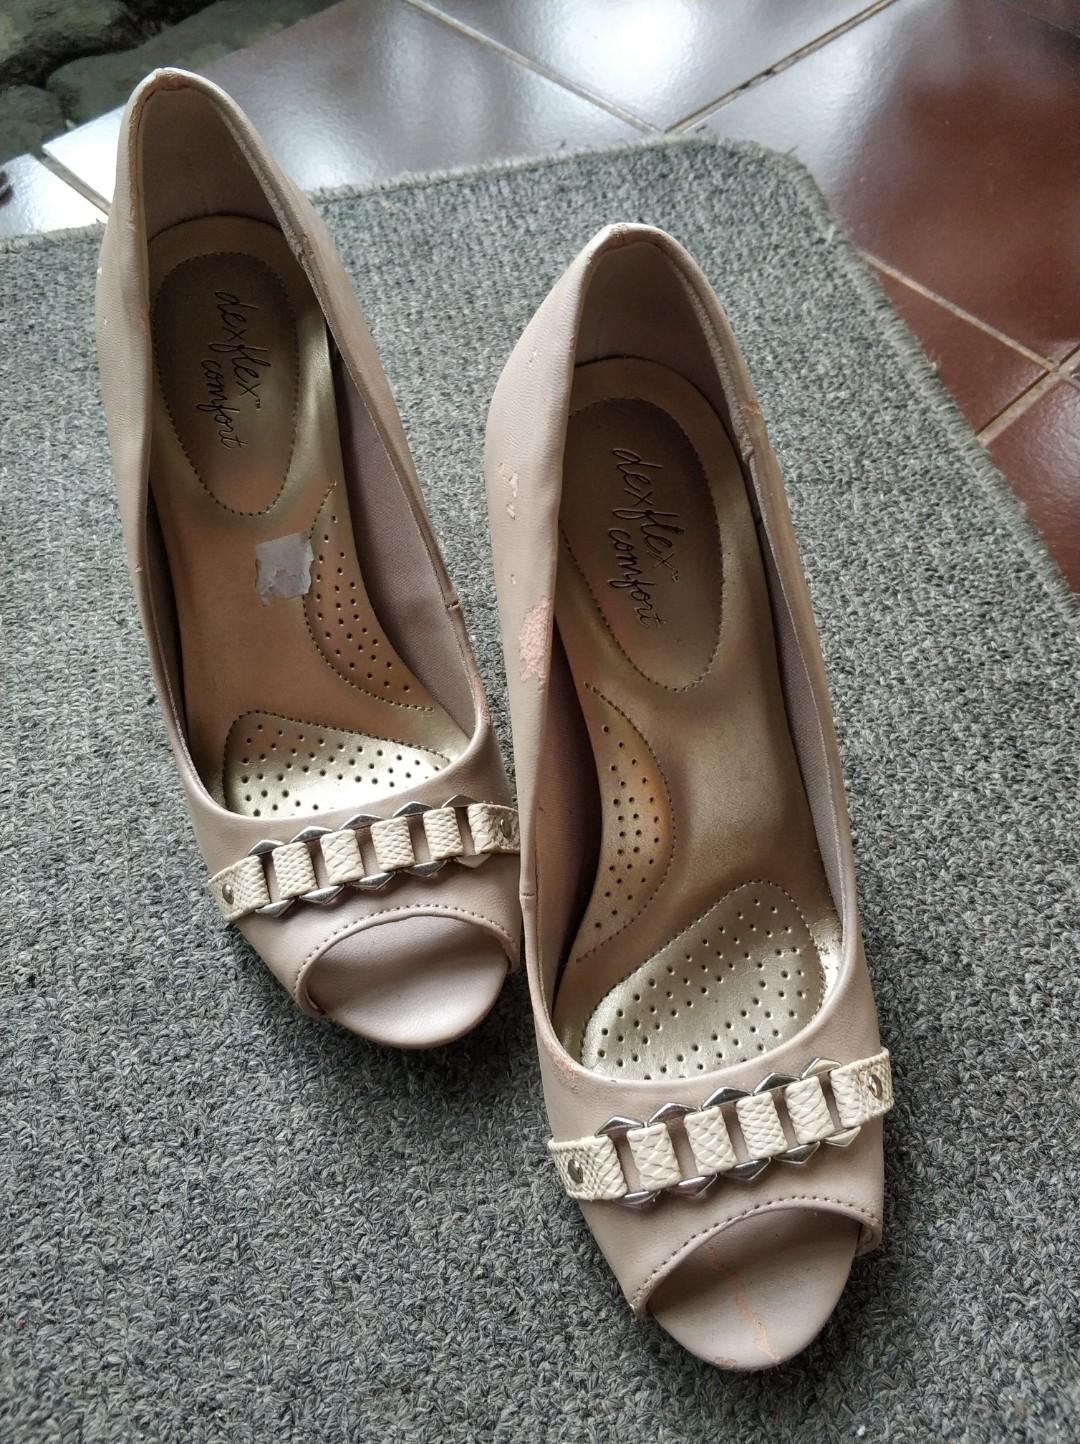 082c84cbfd3e Preloved  High Heels Dexflex Comfort size 7 38